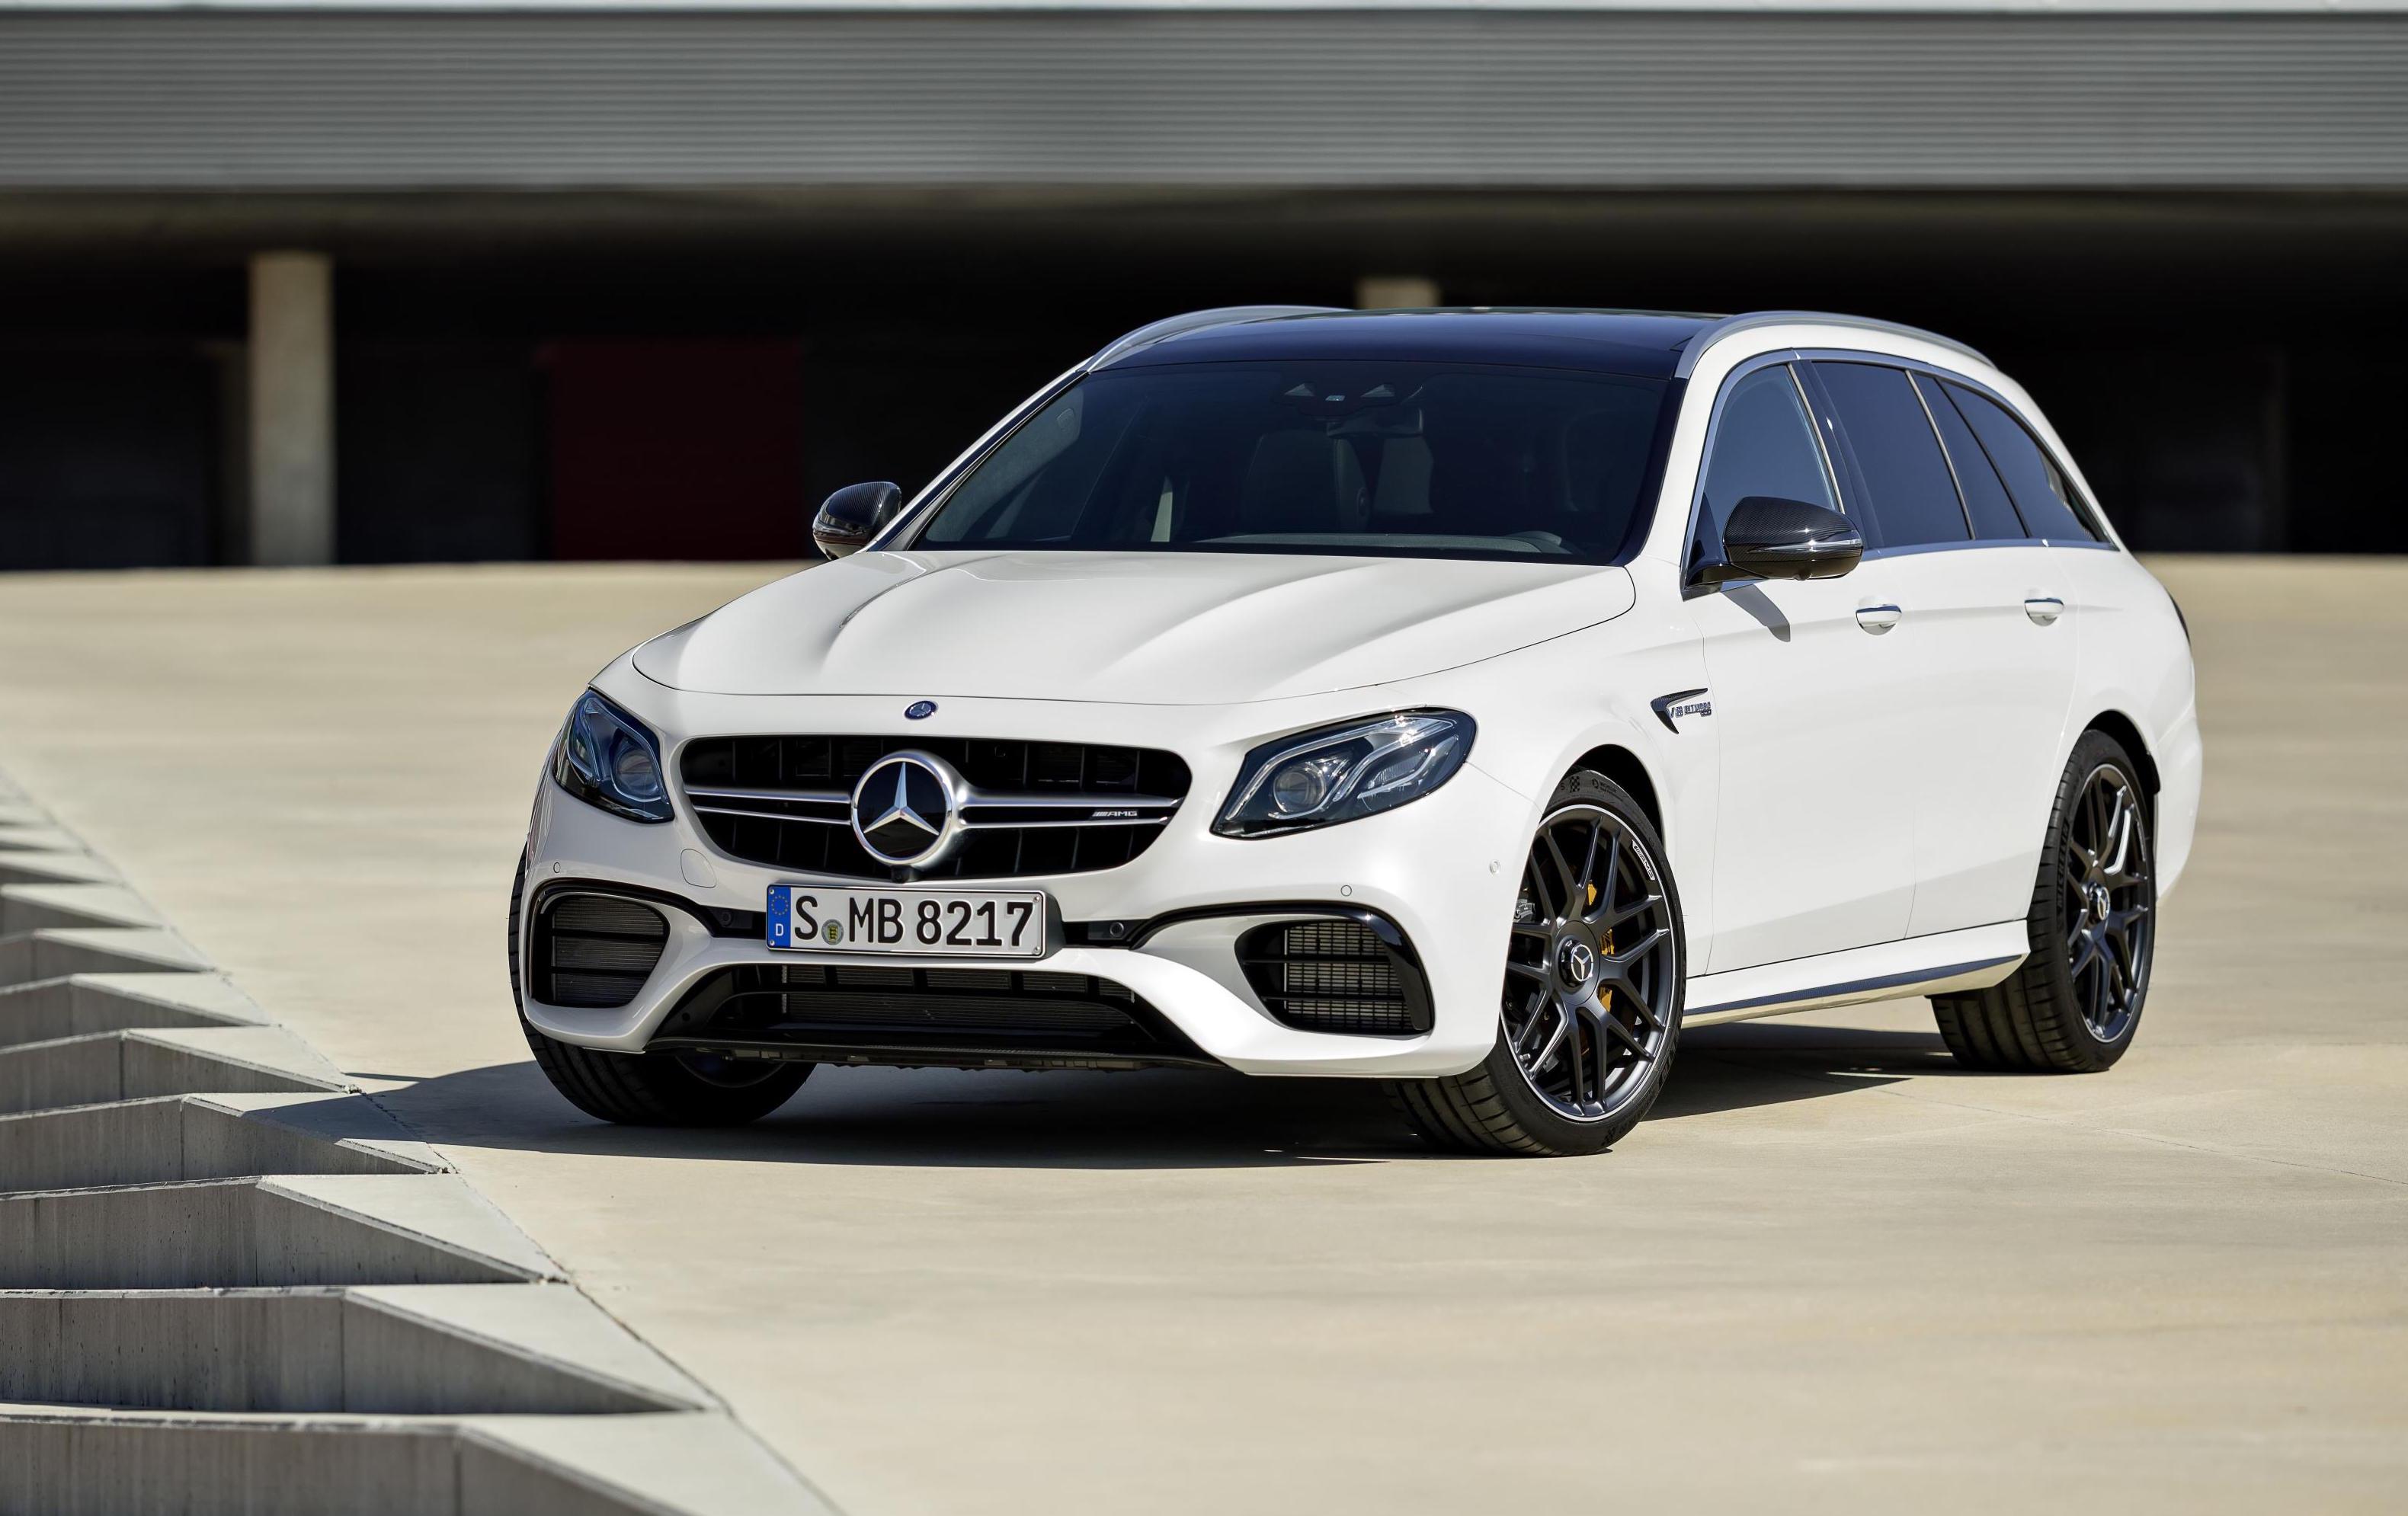 63 Power Wagon >> 2017 Mercedes-AMG E 63 Estate revealed, ultimate 450kW family wagon | PerformanceDrive